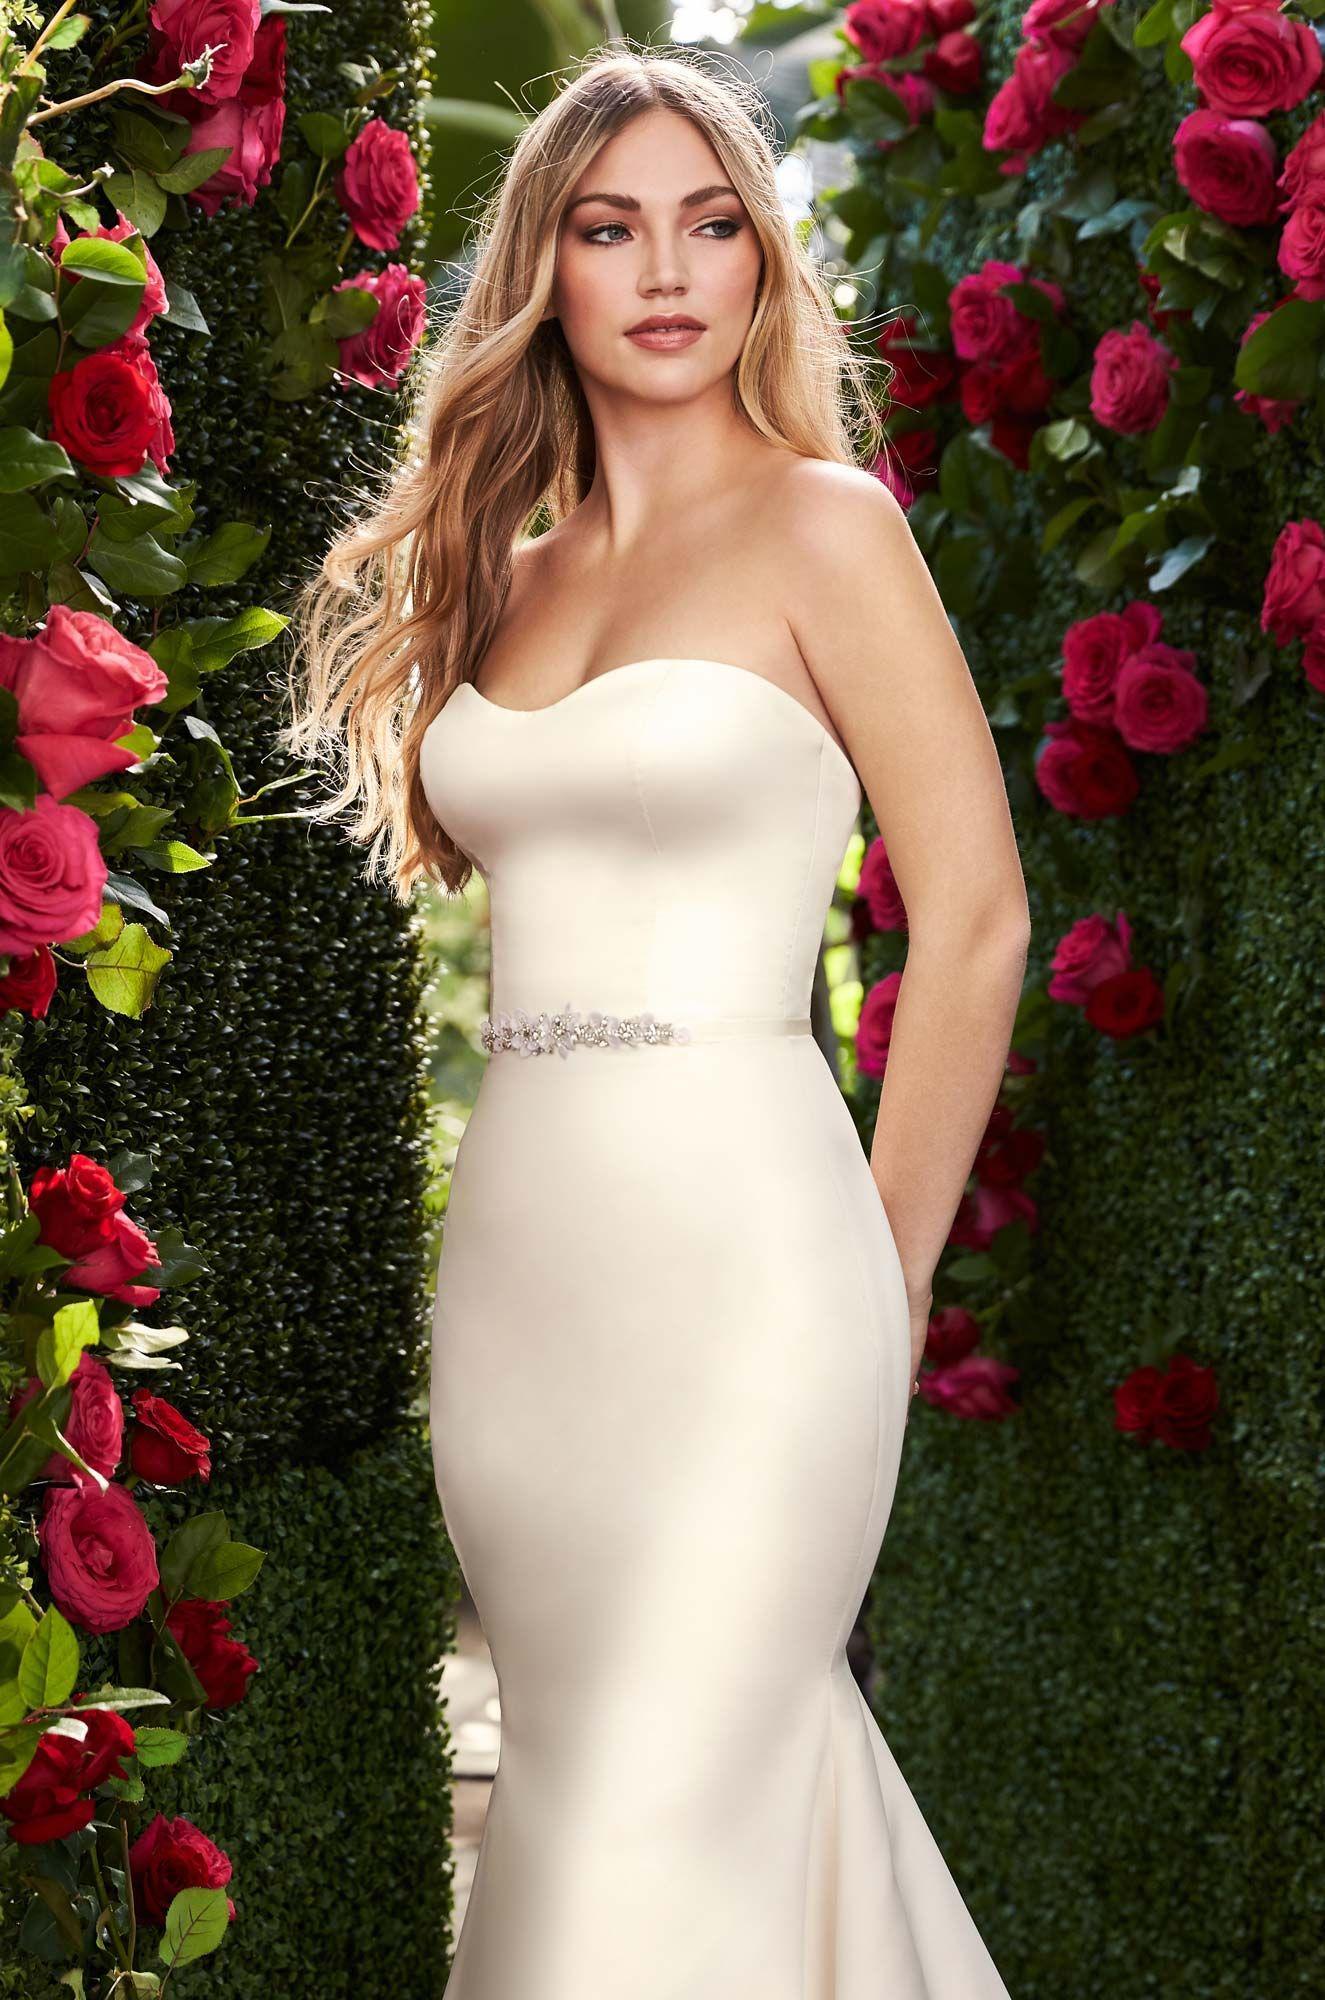 Oversized Bow Wedding Dress - Style #2267 #duchesssatin